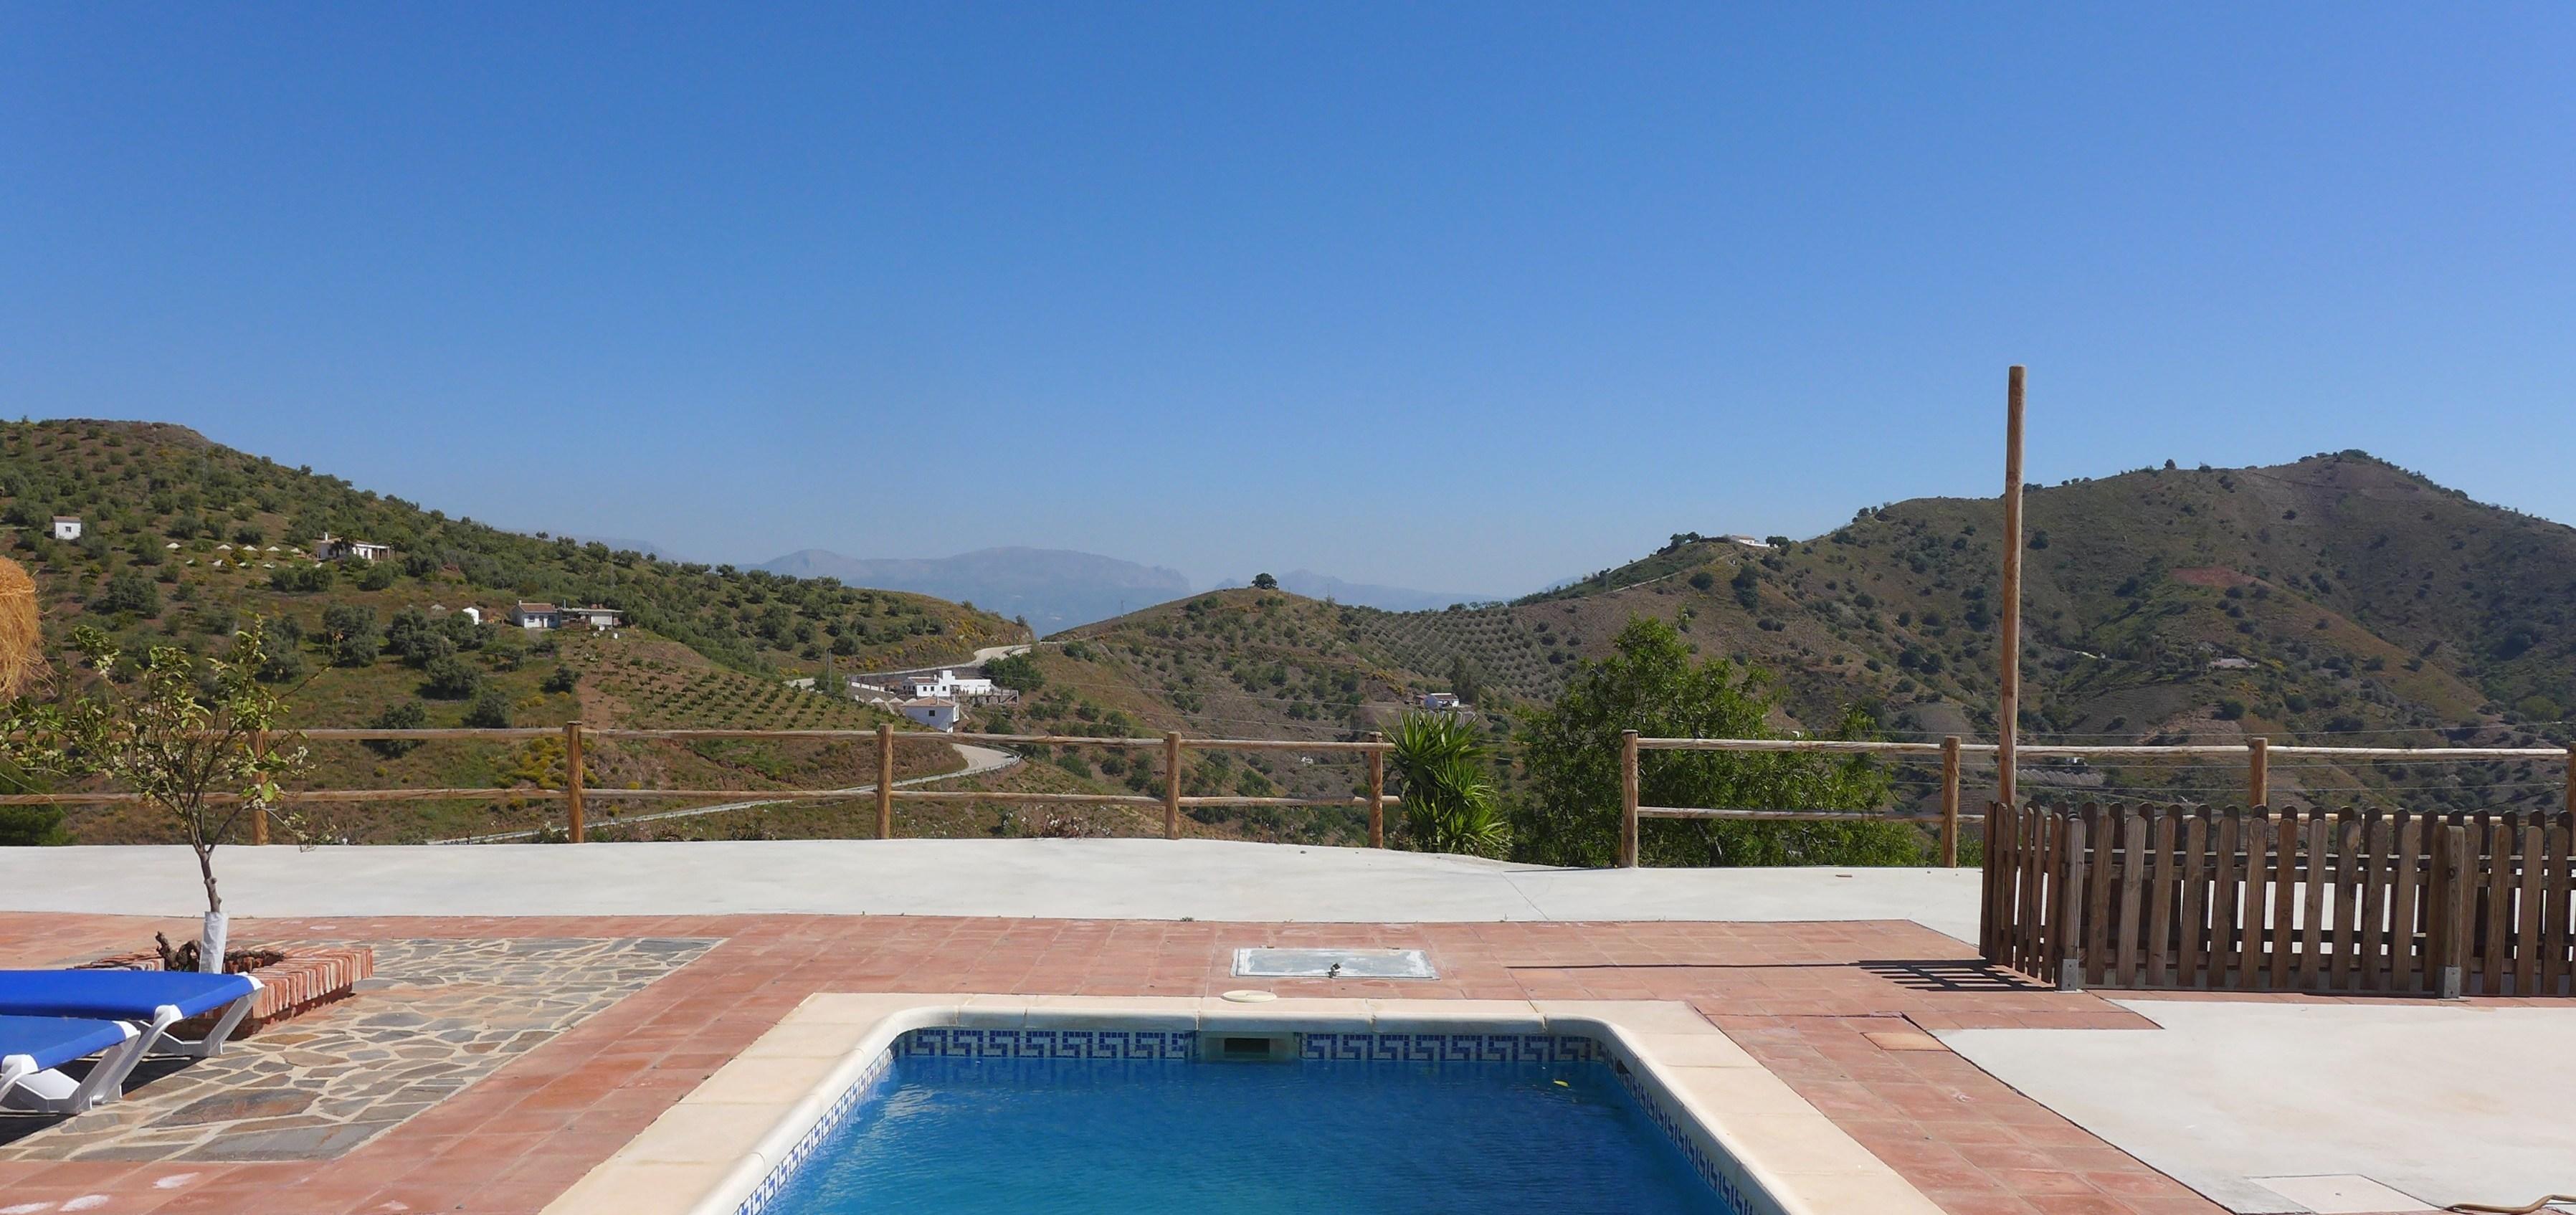 Andalusie vakantiehuis